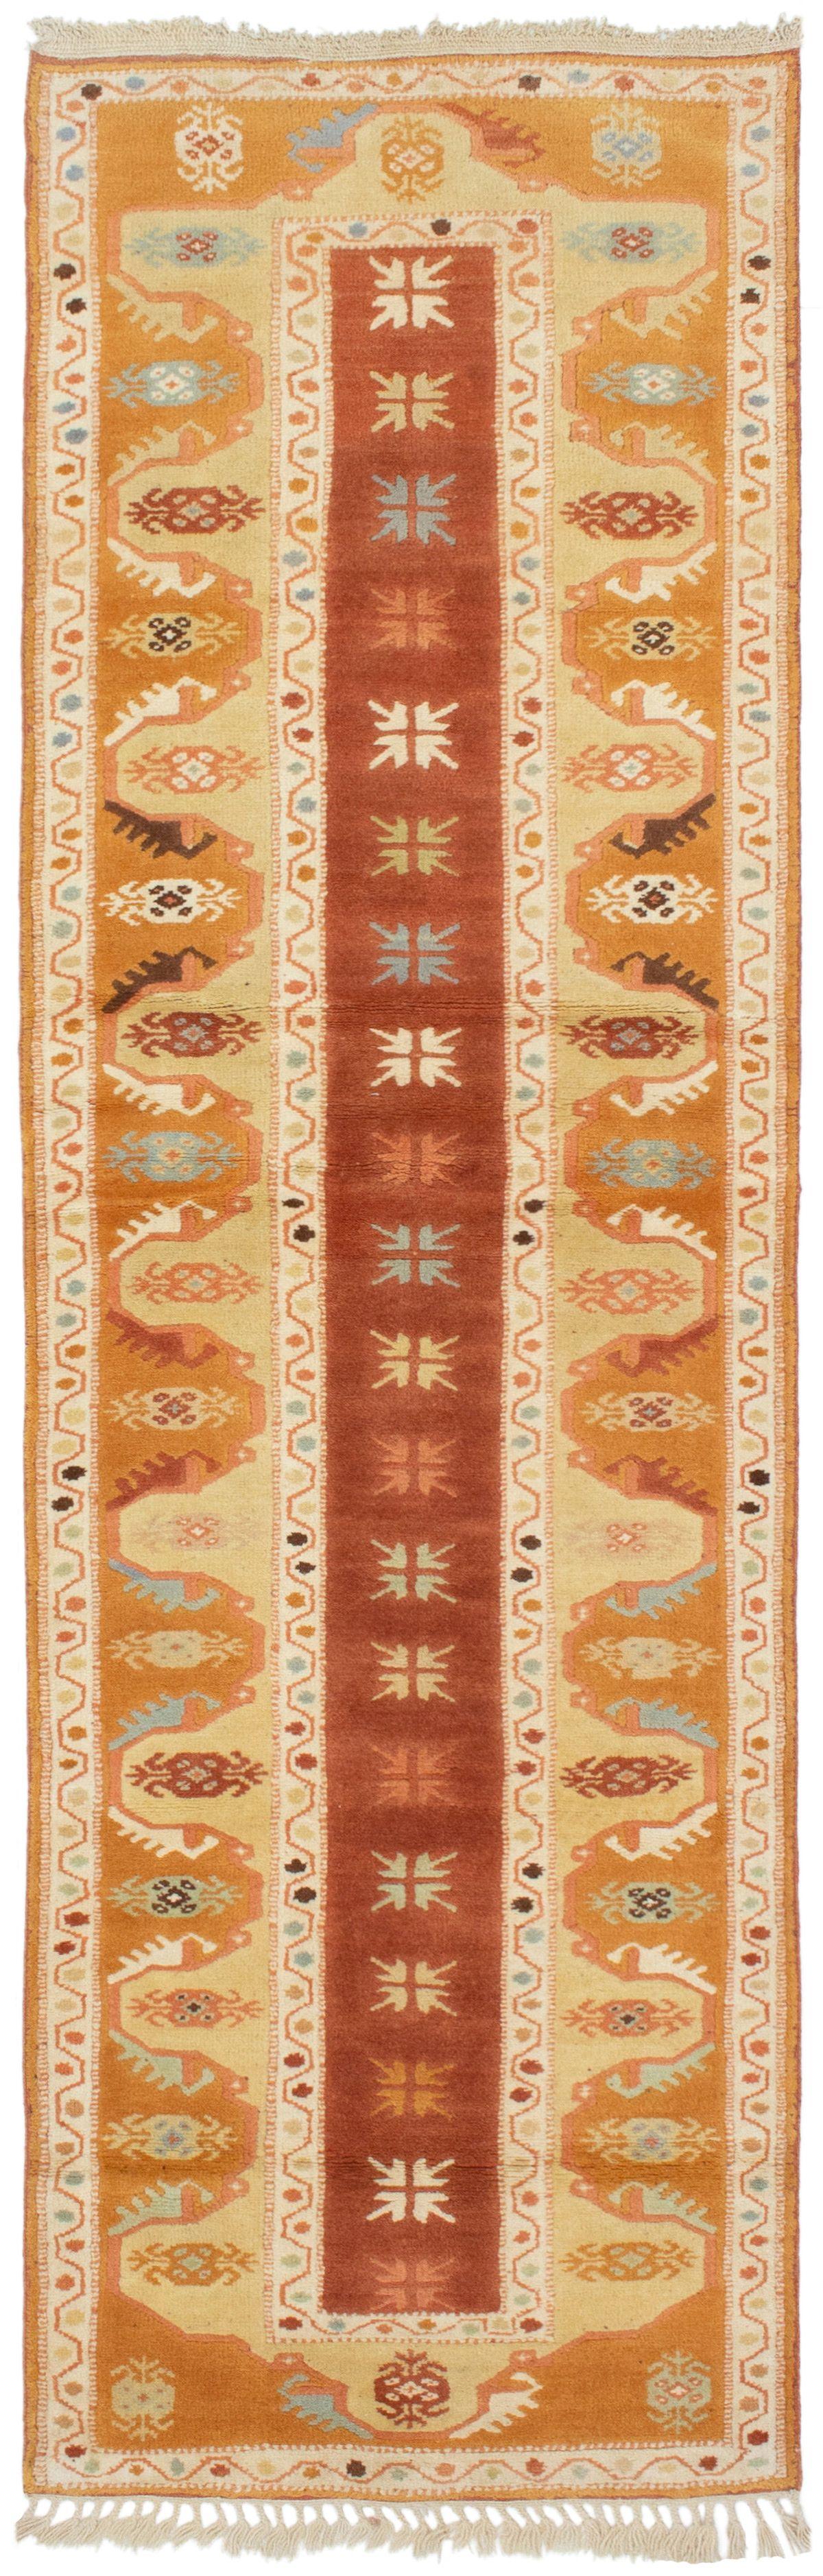 "Hand-knotted Ushak Burnt Orange, Dark Copper Wool Rug 2'8"" x 8'9"" Size: 2'8"" x 8'9"""